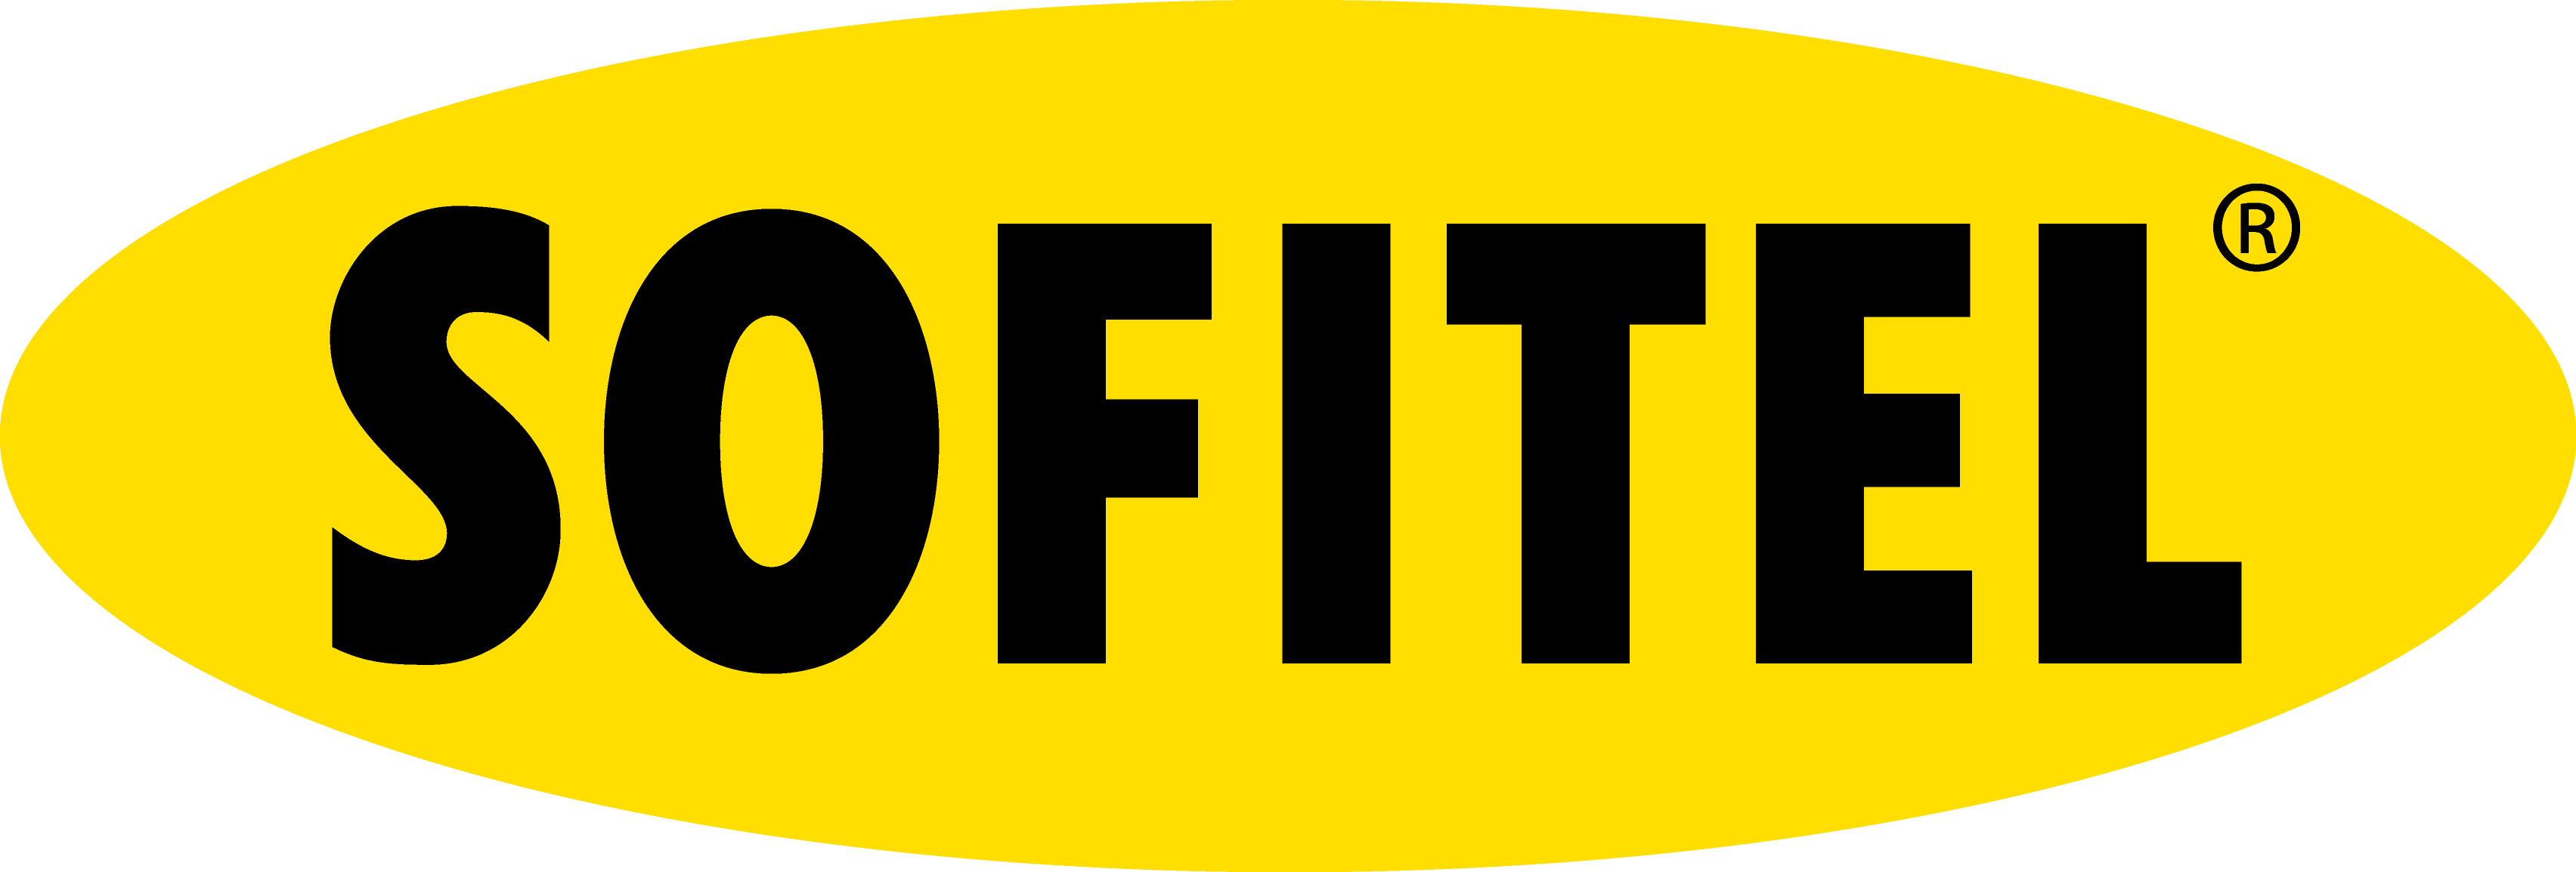 SOFITEL s.r.l.